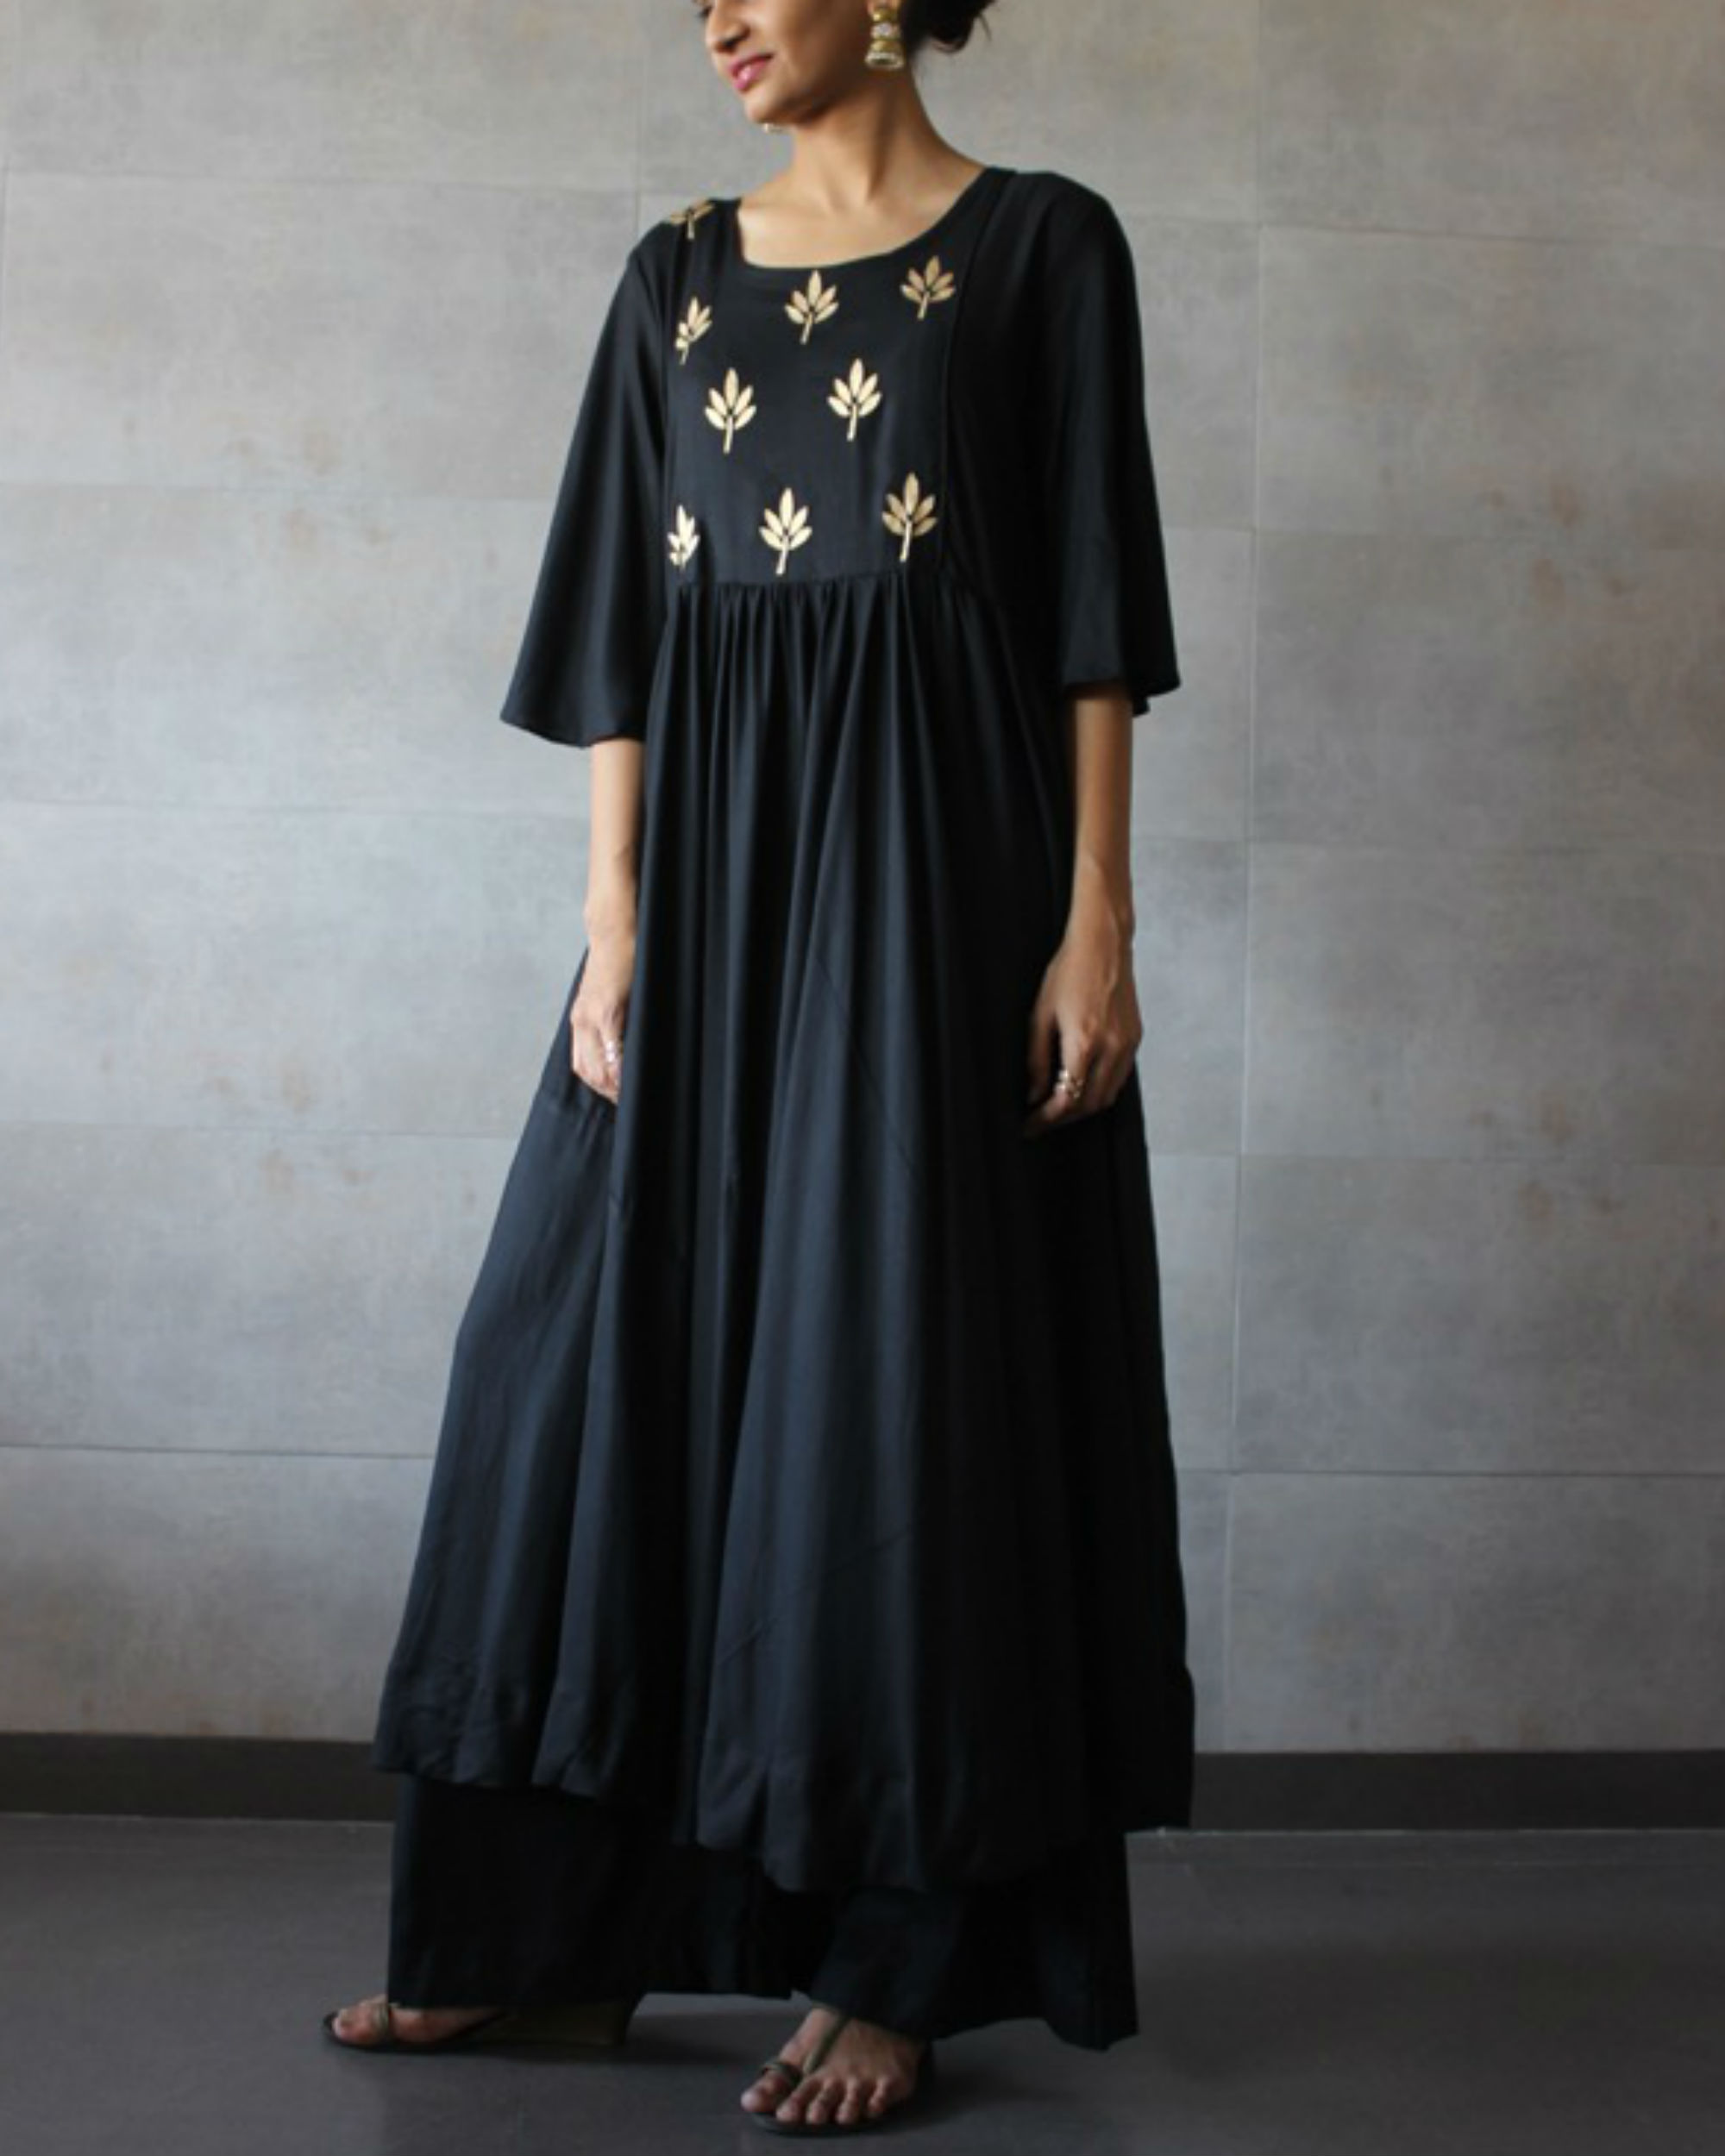 Ihram Kids For Sale Dubai: Black Pleated Kurta Palazzo Set By The Label Studio